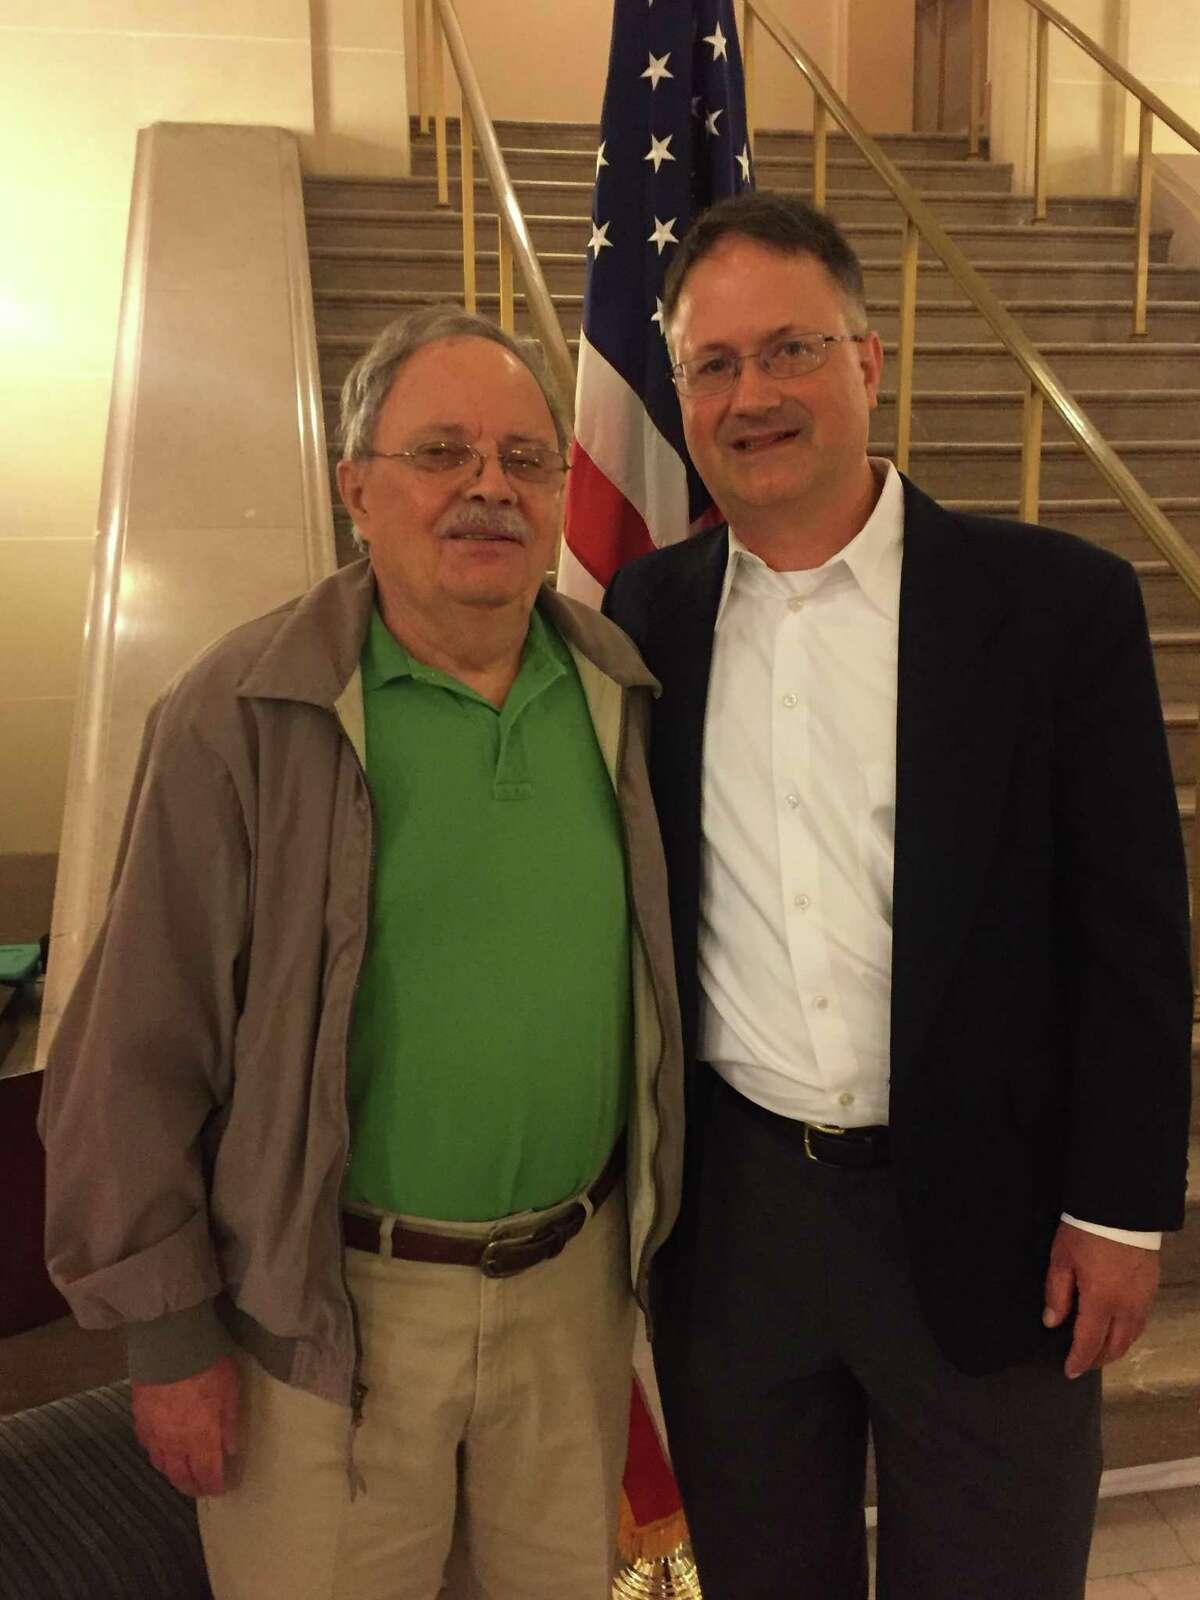 Frank and John DiCesare